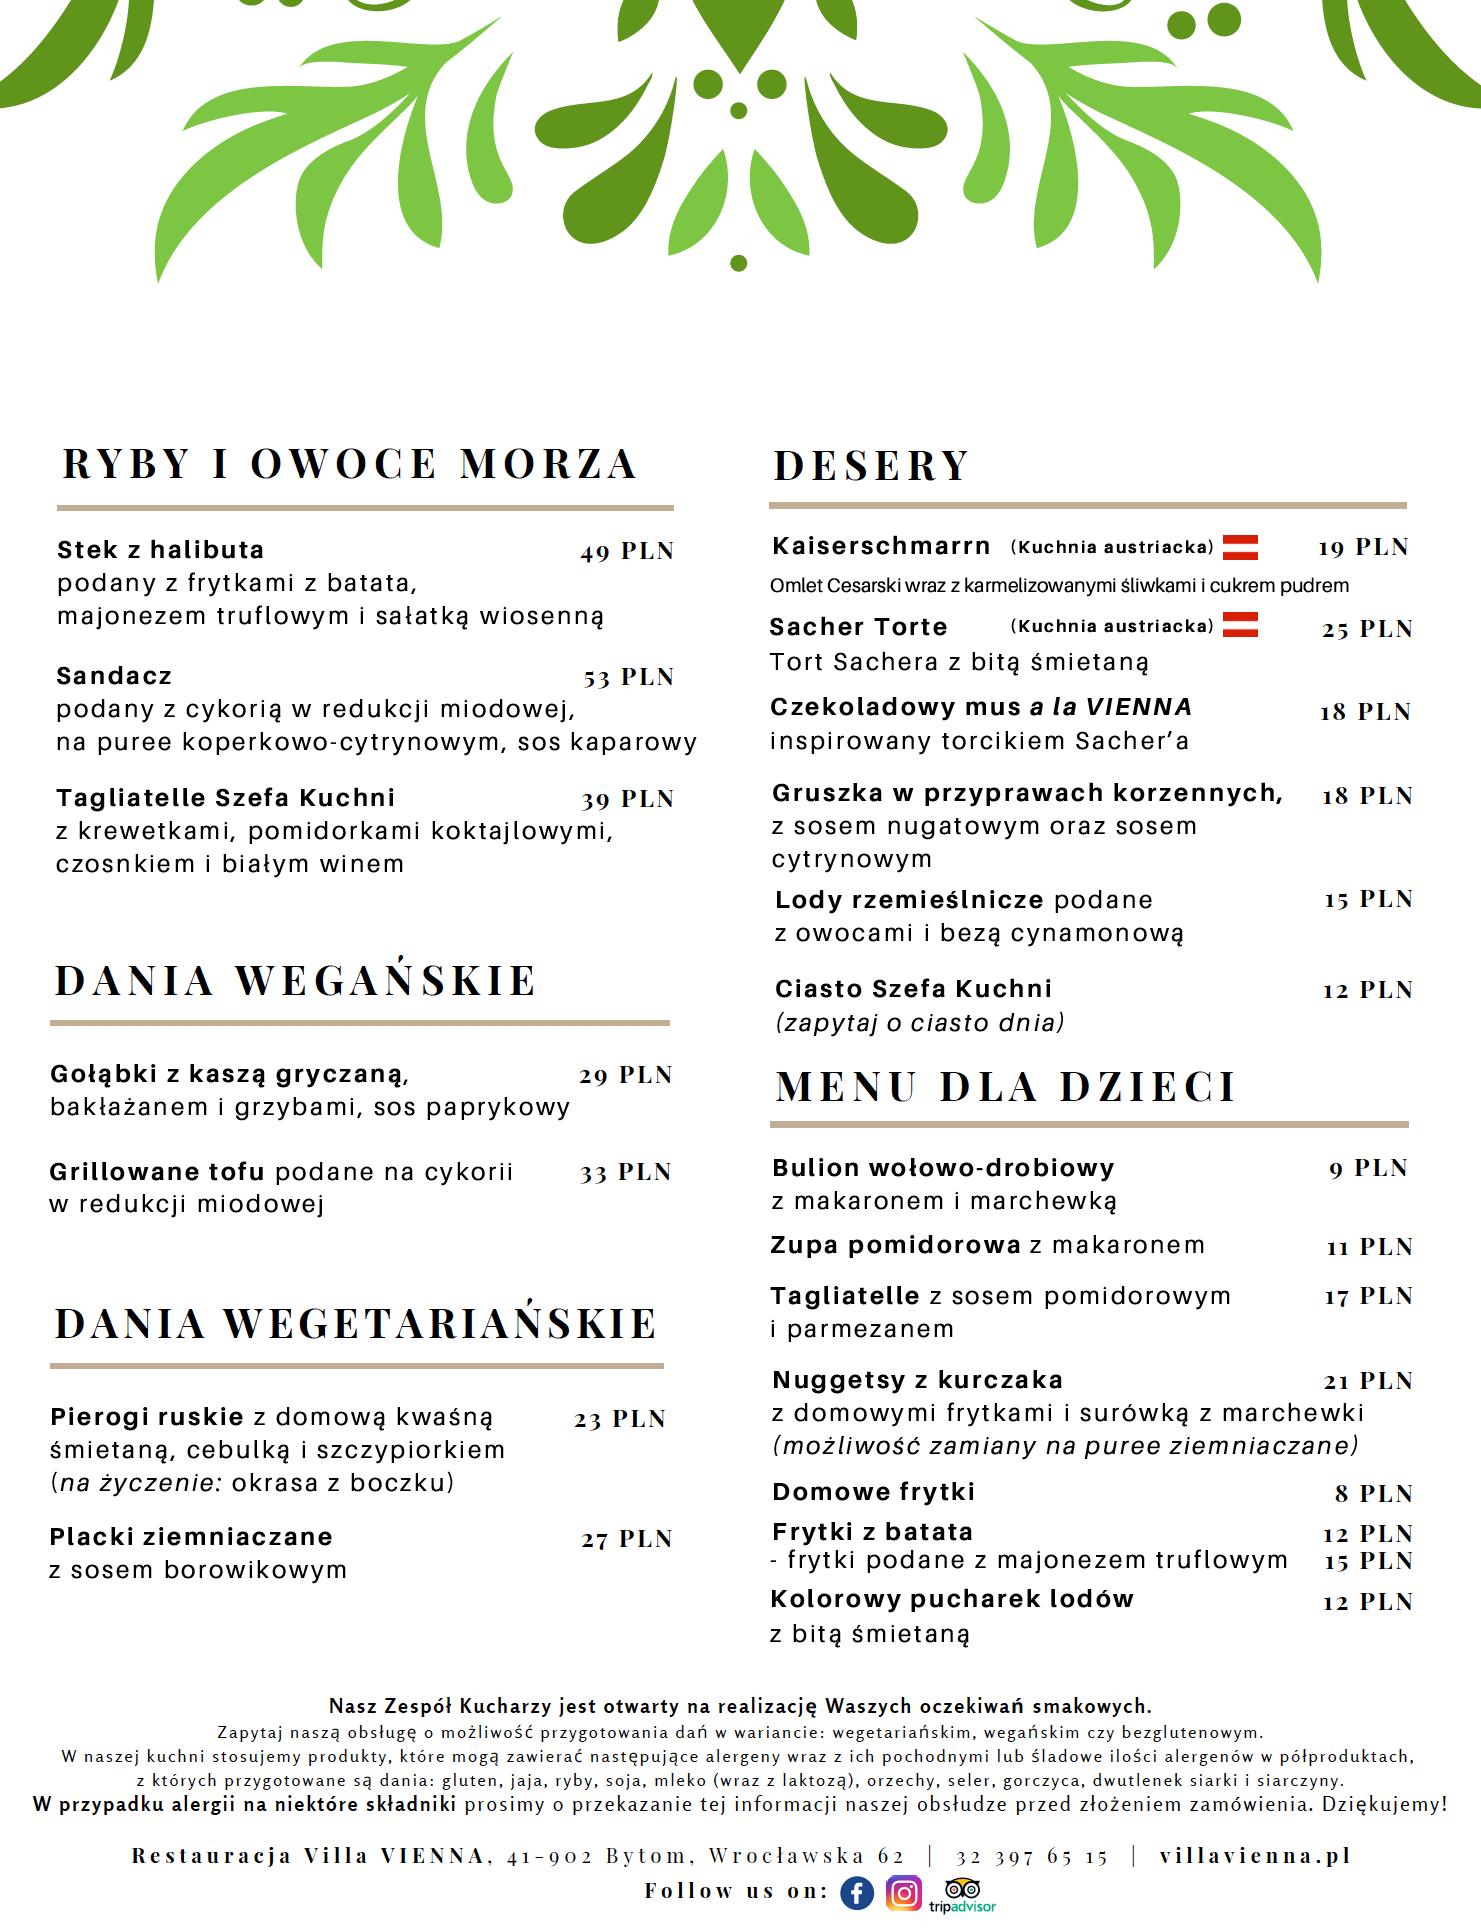 Menu-Villa-Vienna-Ryby-Owoce-Desery-Menu-dla-dzieci